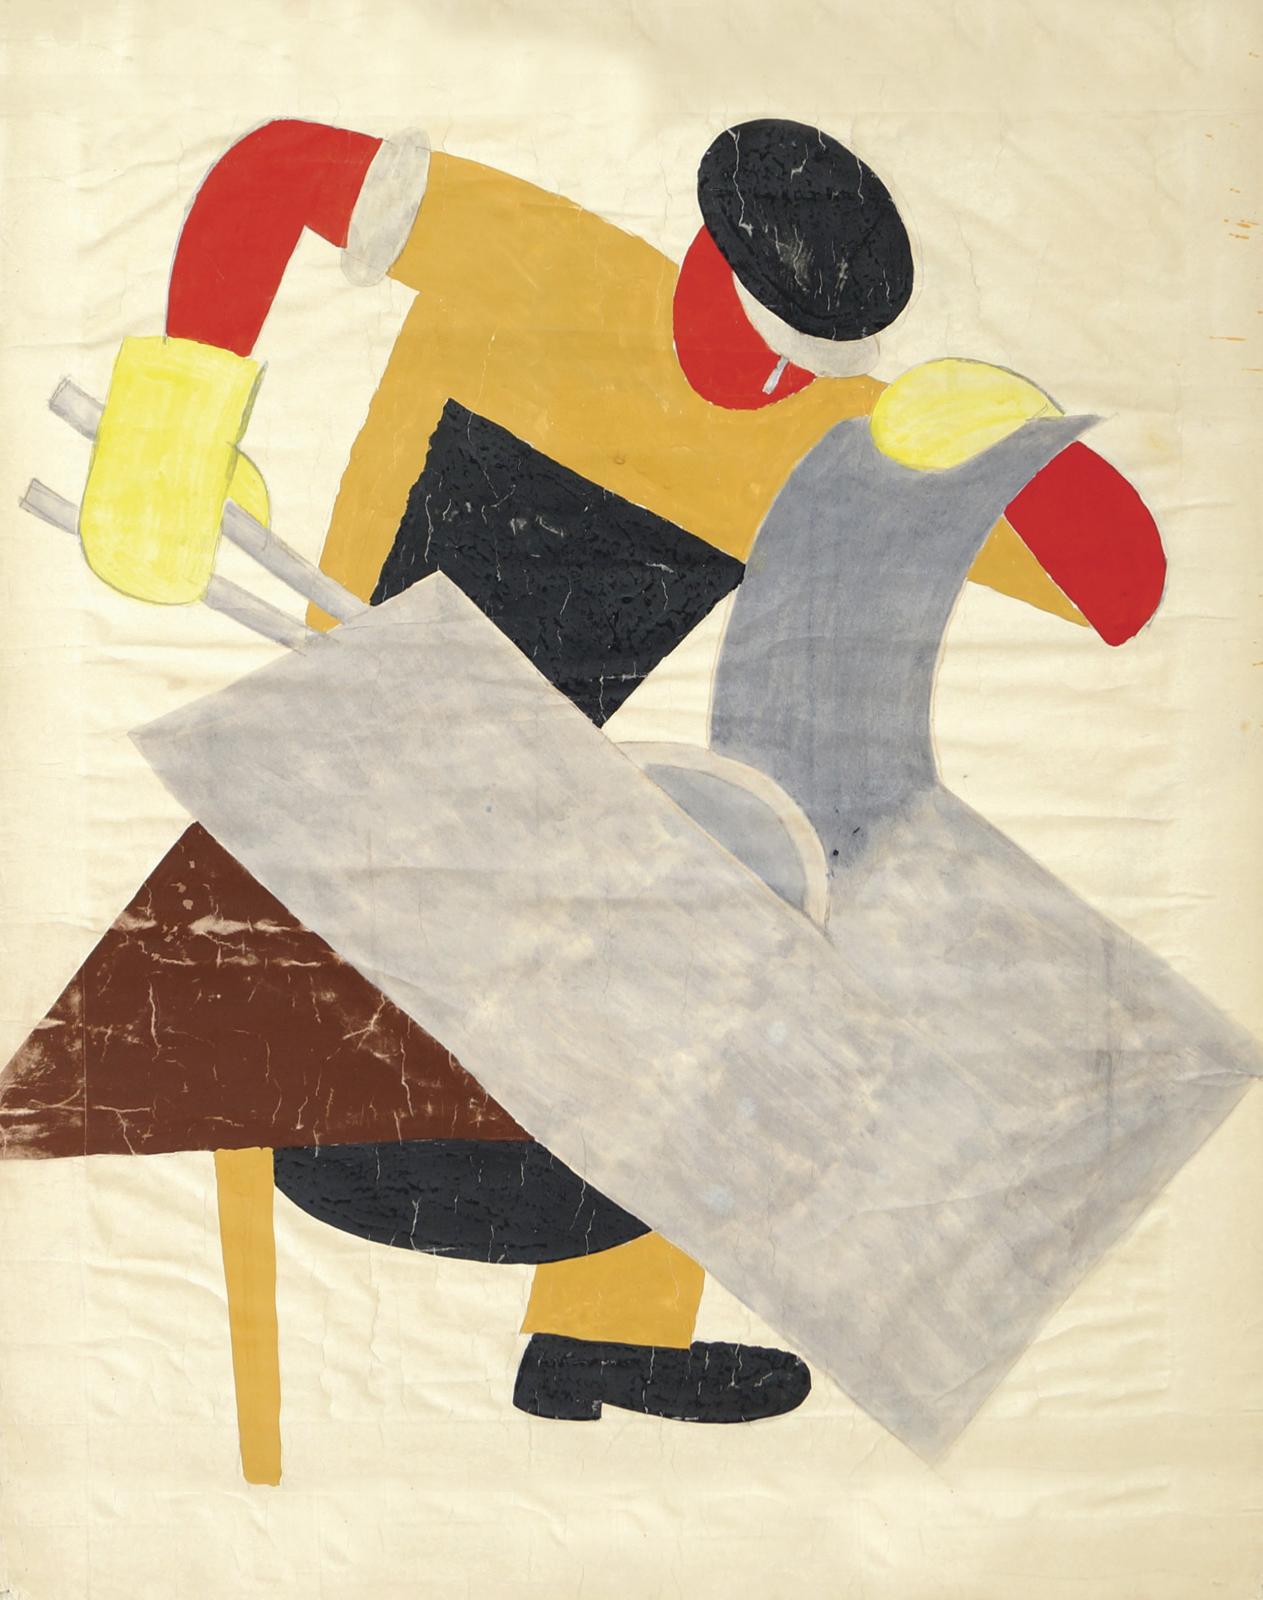 vanguardia-rusa-sovietico-siglo-xx-arte-cortandohierro